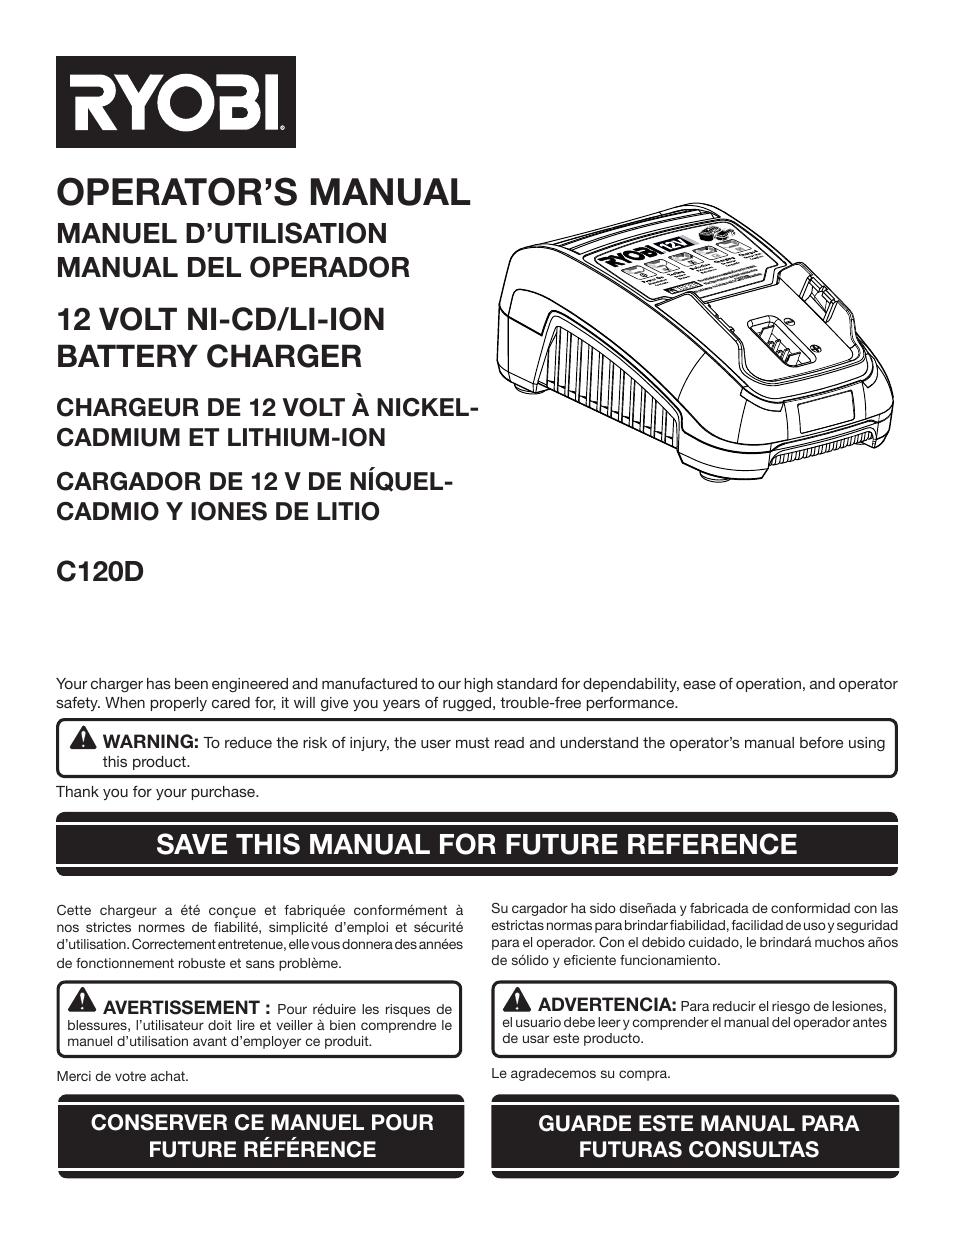 ryobi tv manual daily instruction manual guides u2022 rh testingwordpress co ryobi weed eater manual 18v ryobi weed eater manual 29550